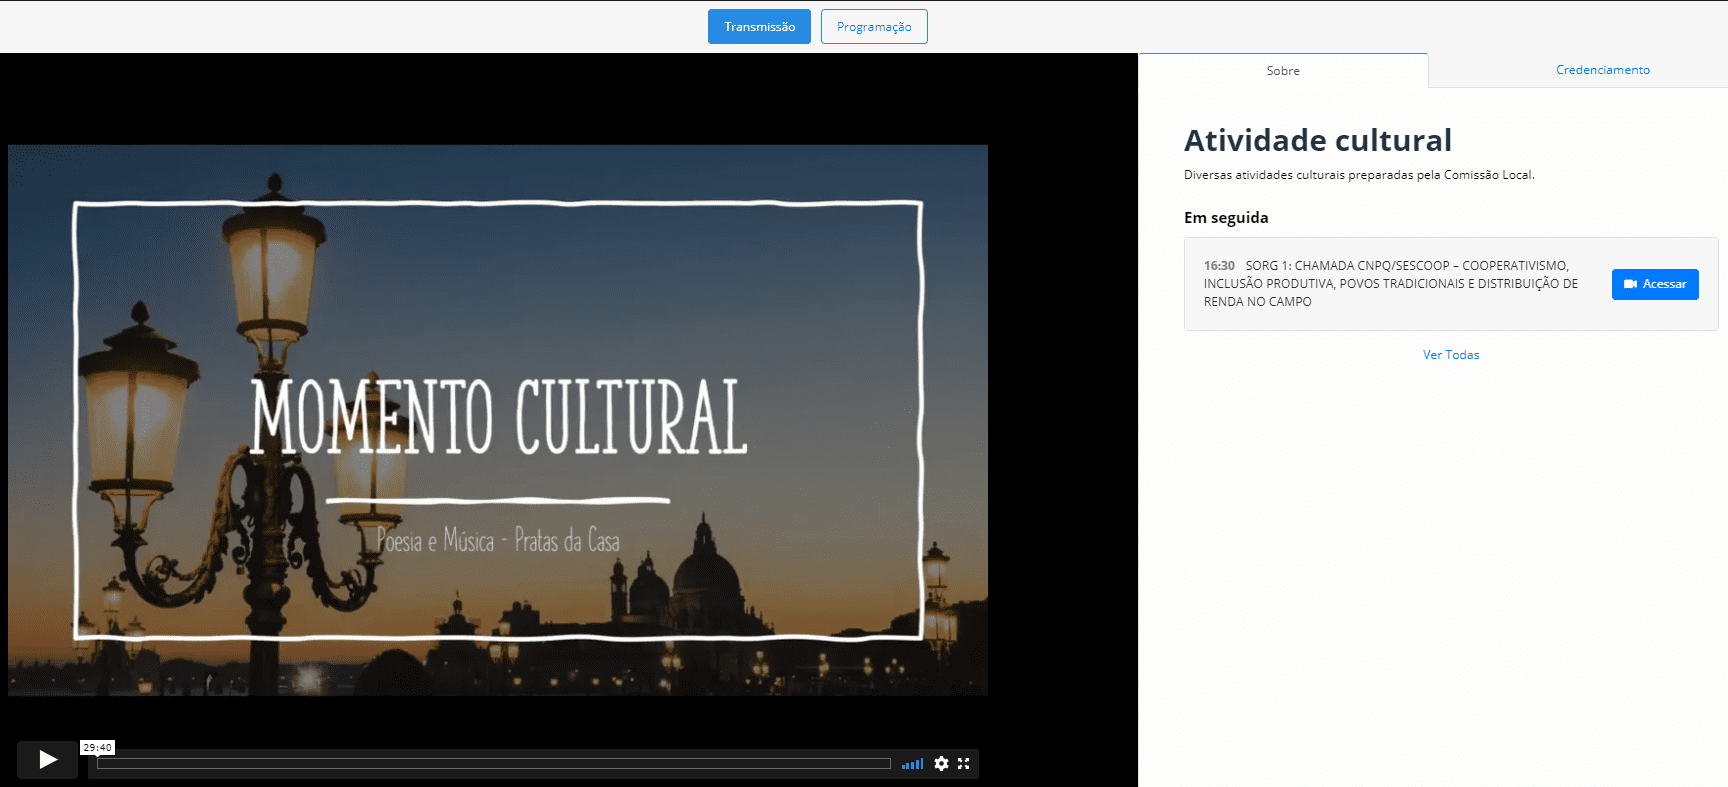 Atividade cultural